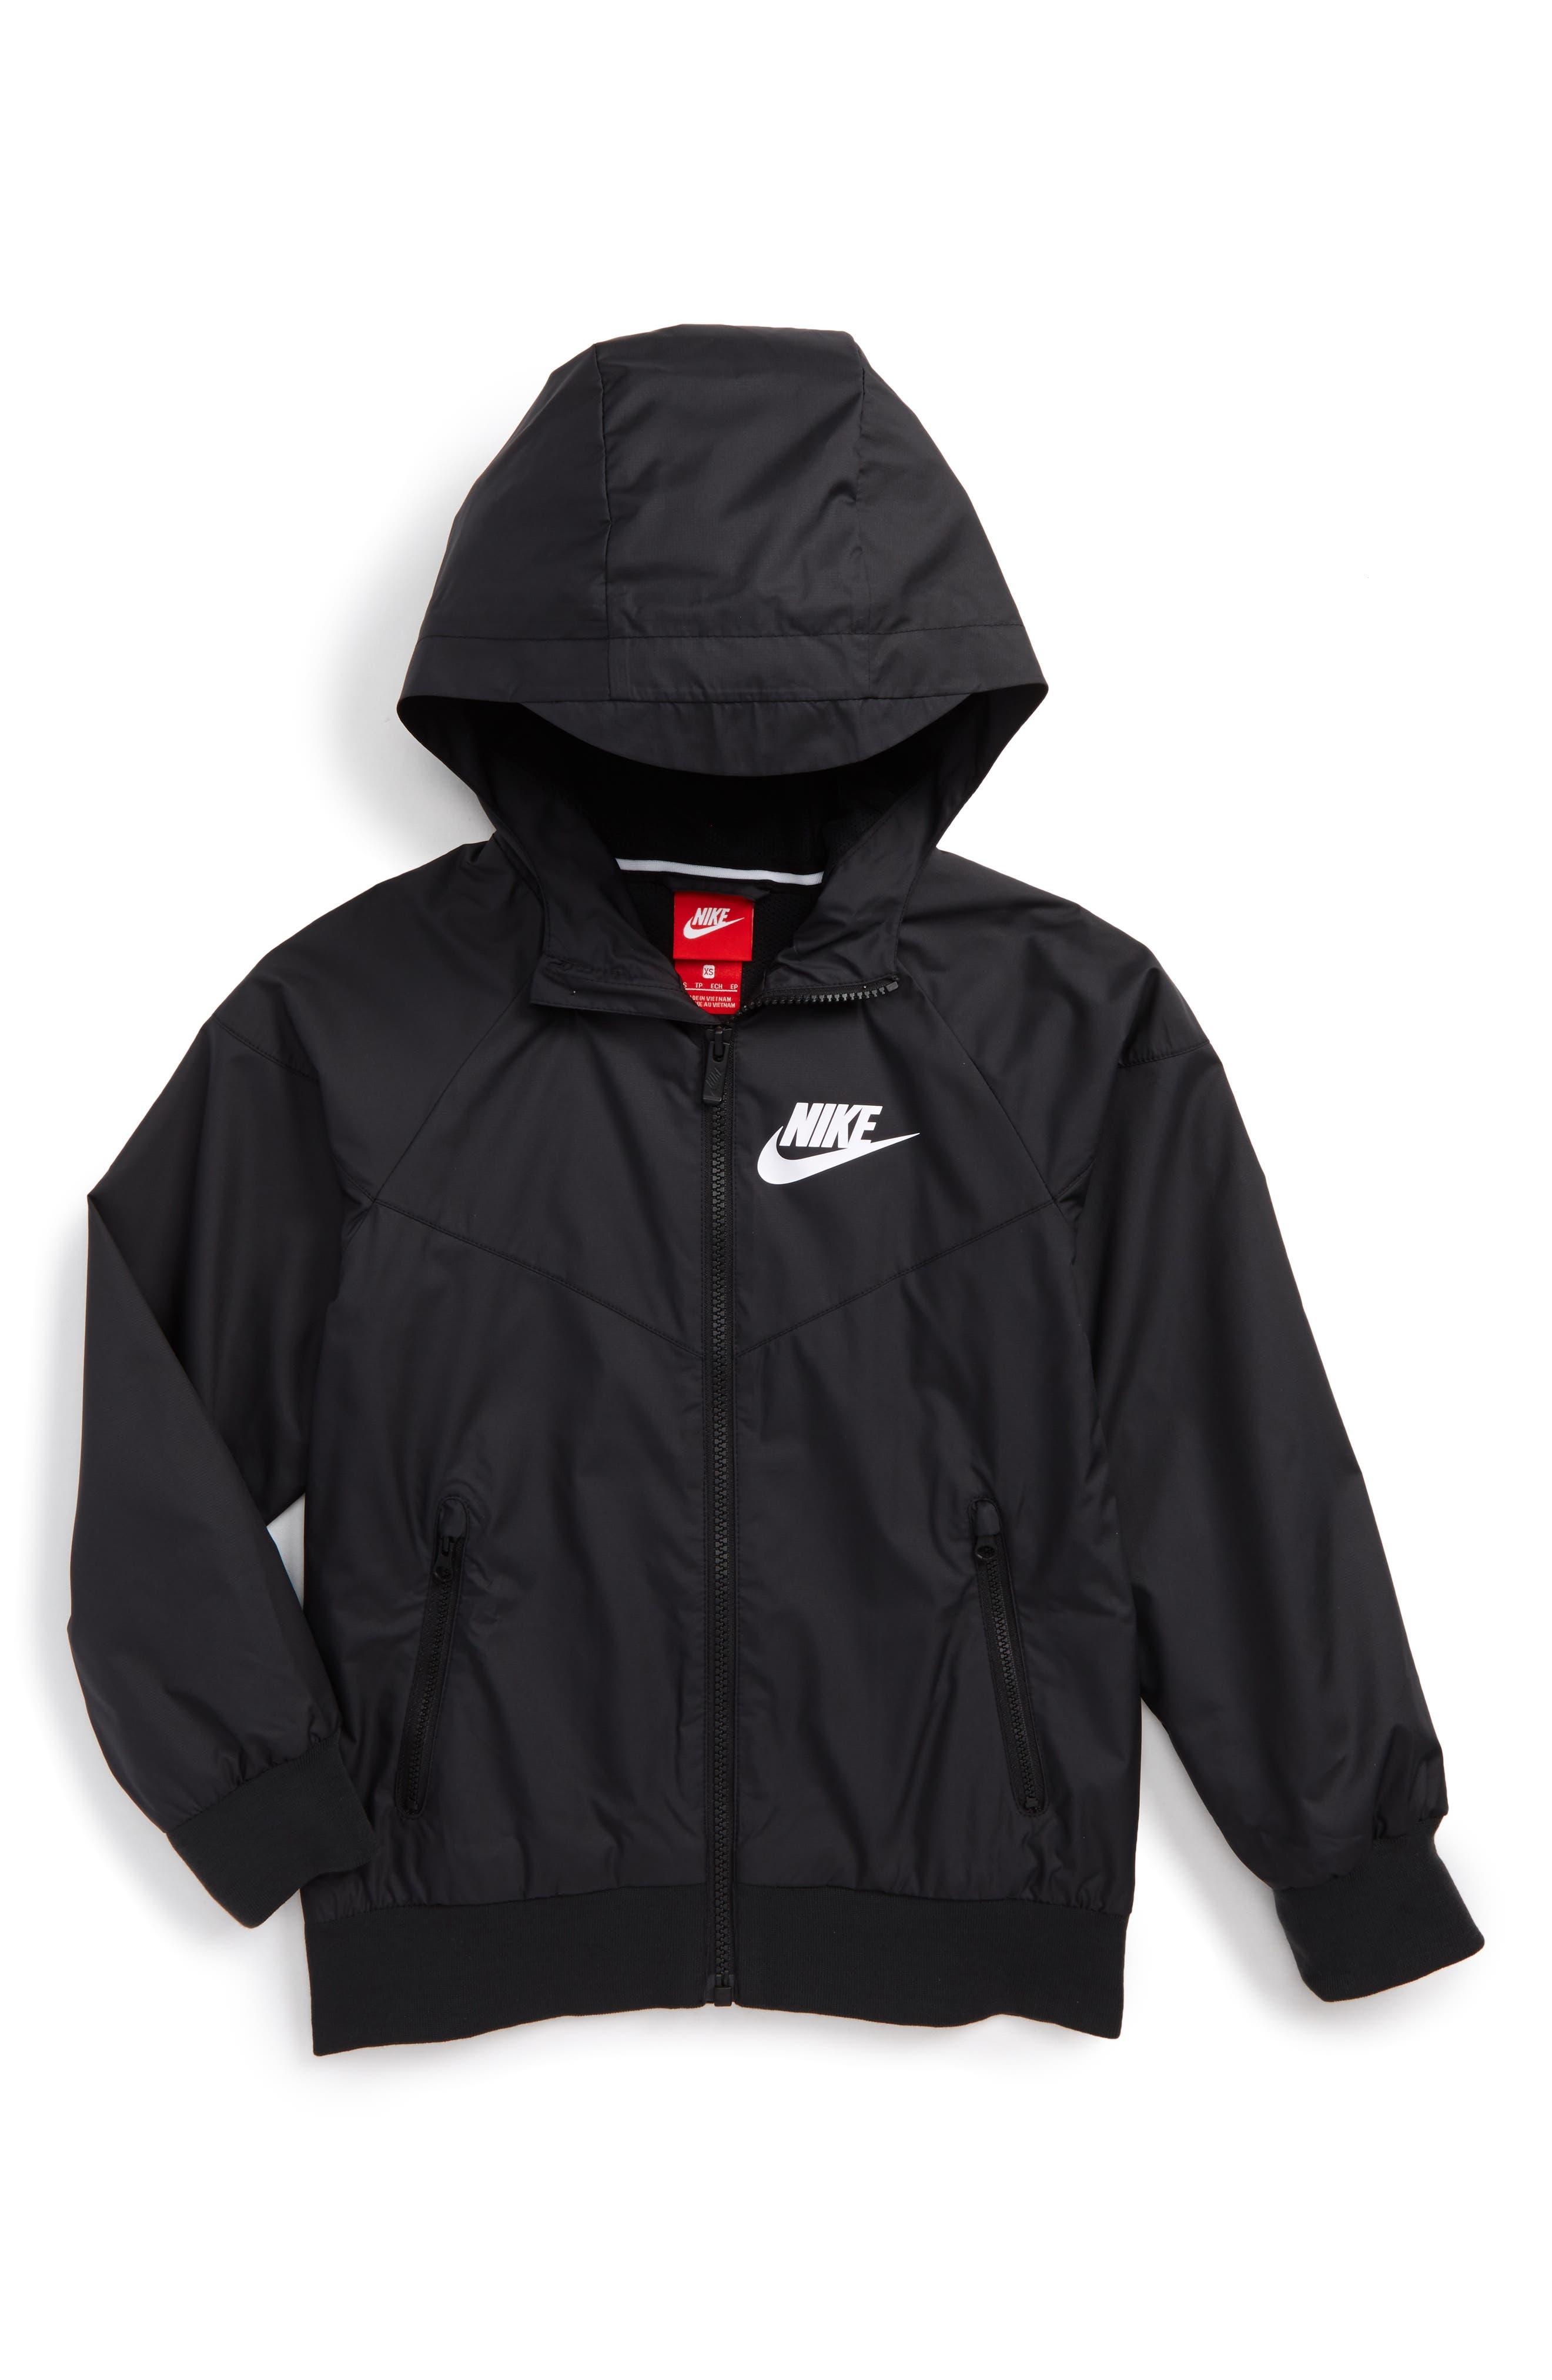 Windrunner Water Resistant Hooded Jacket,                         Main,                         color, Black/ White